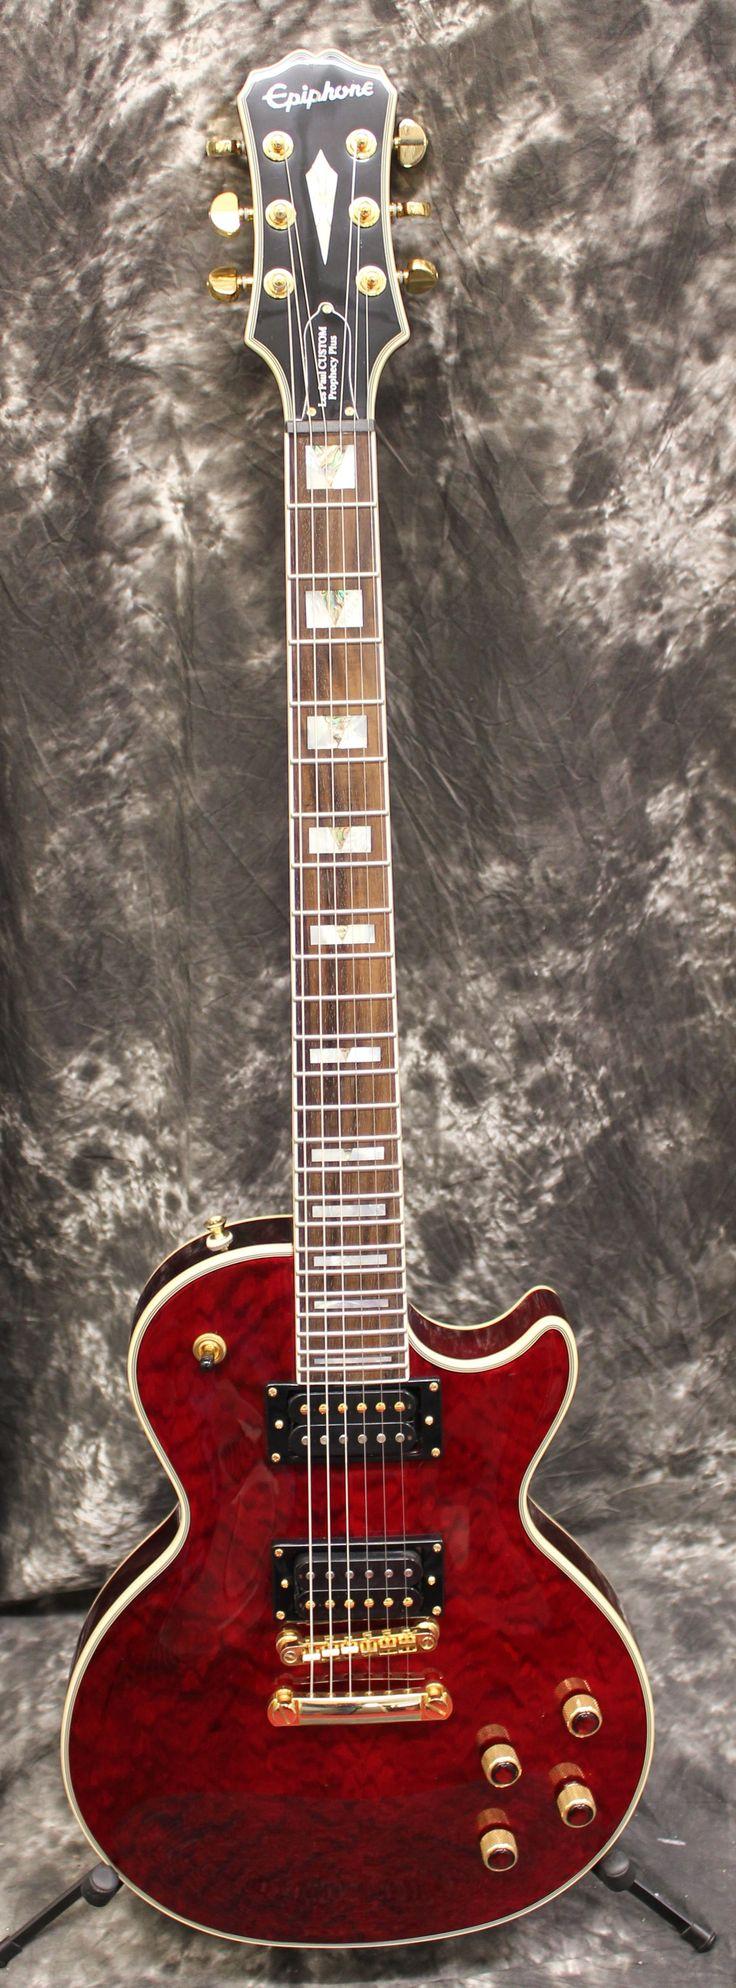 2016 Epiphone Les Paul Prophecy Custom Pro GX Red Electric Guitar w/Case